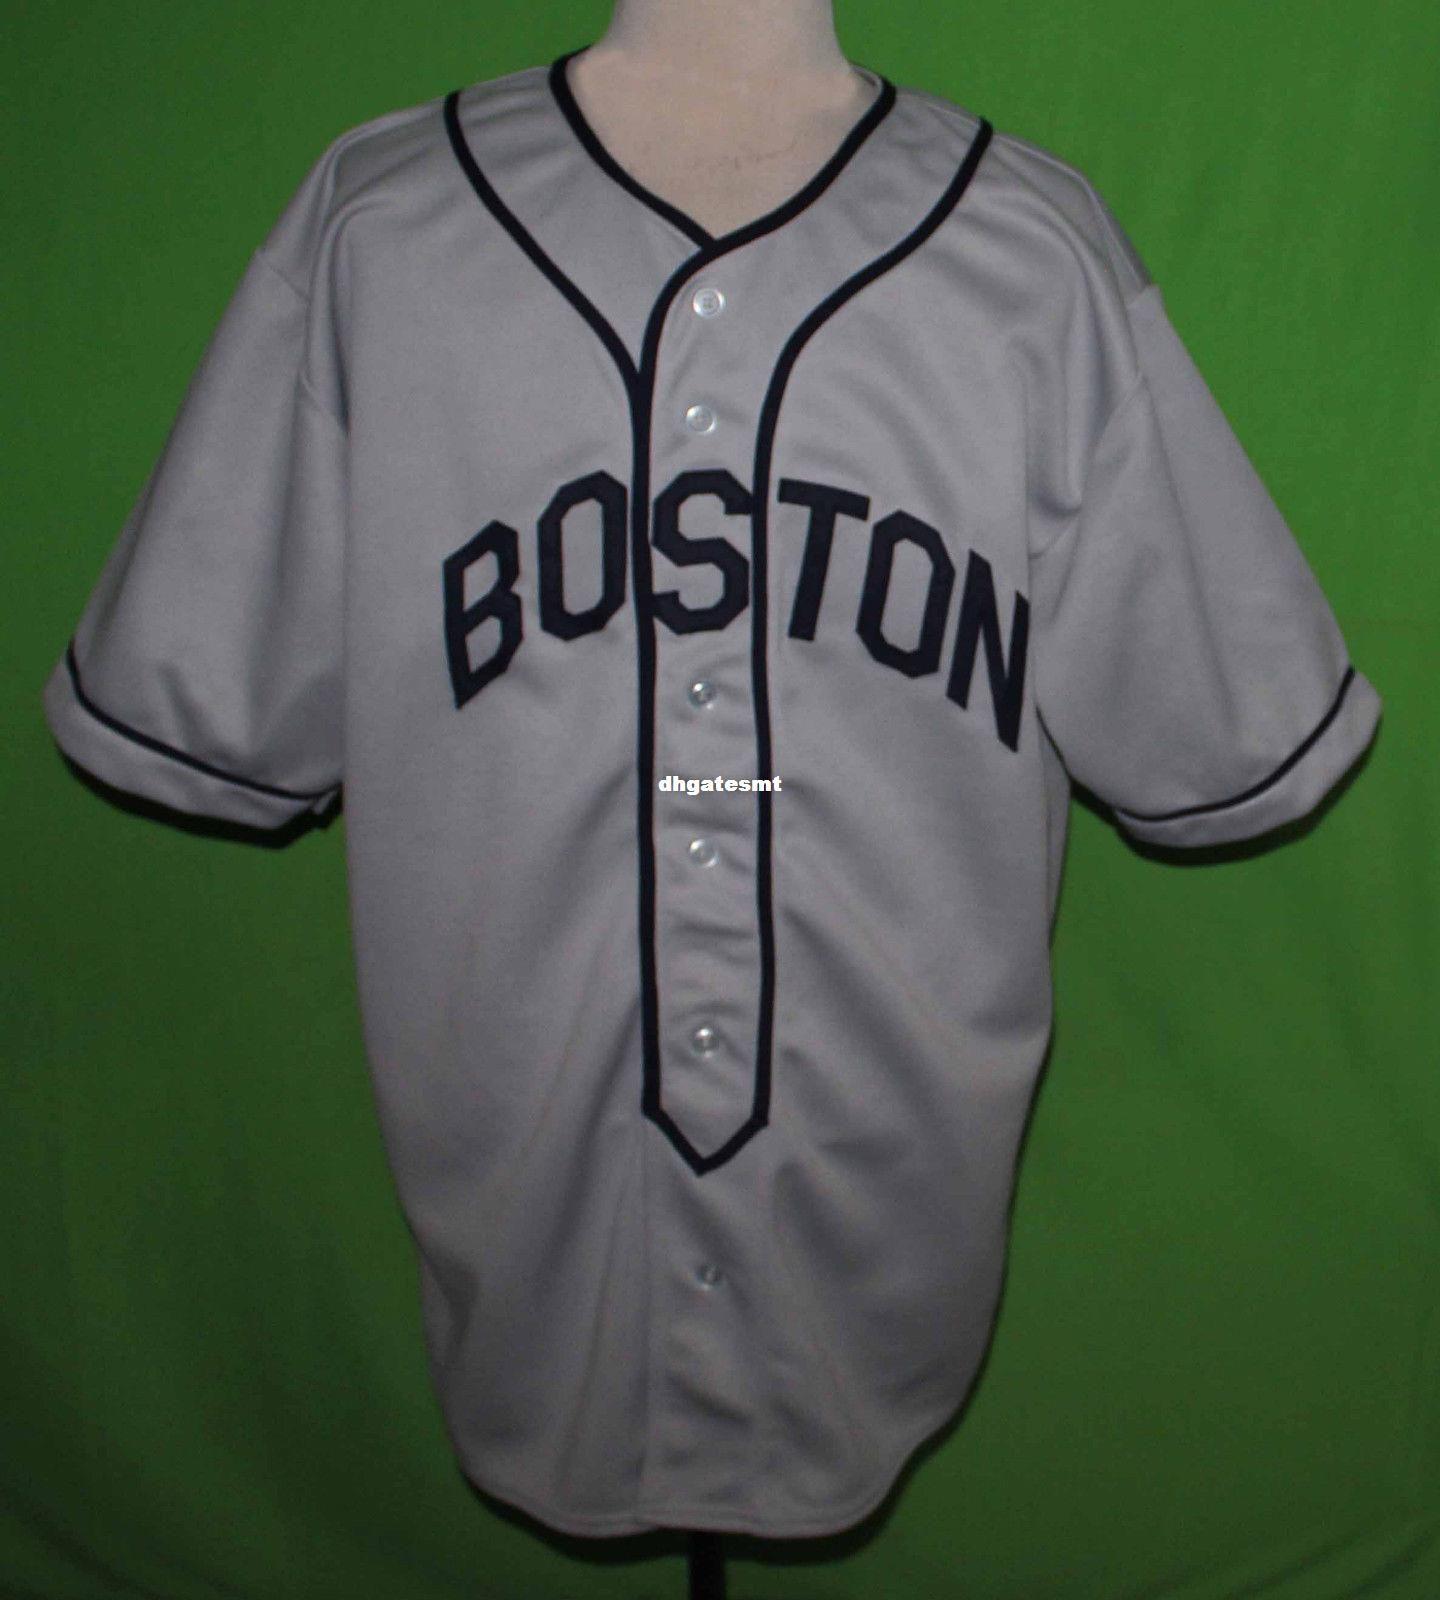 794113a1 Boston Red Sox 2013 World Series Champions Celebr8 T Shirt ...